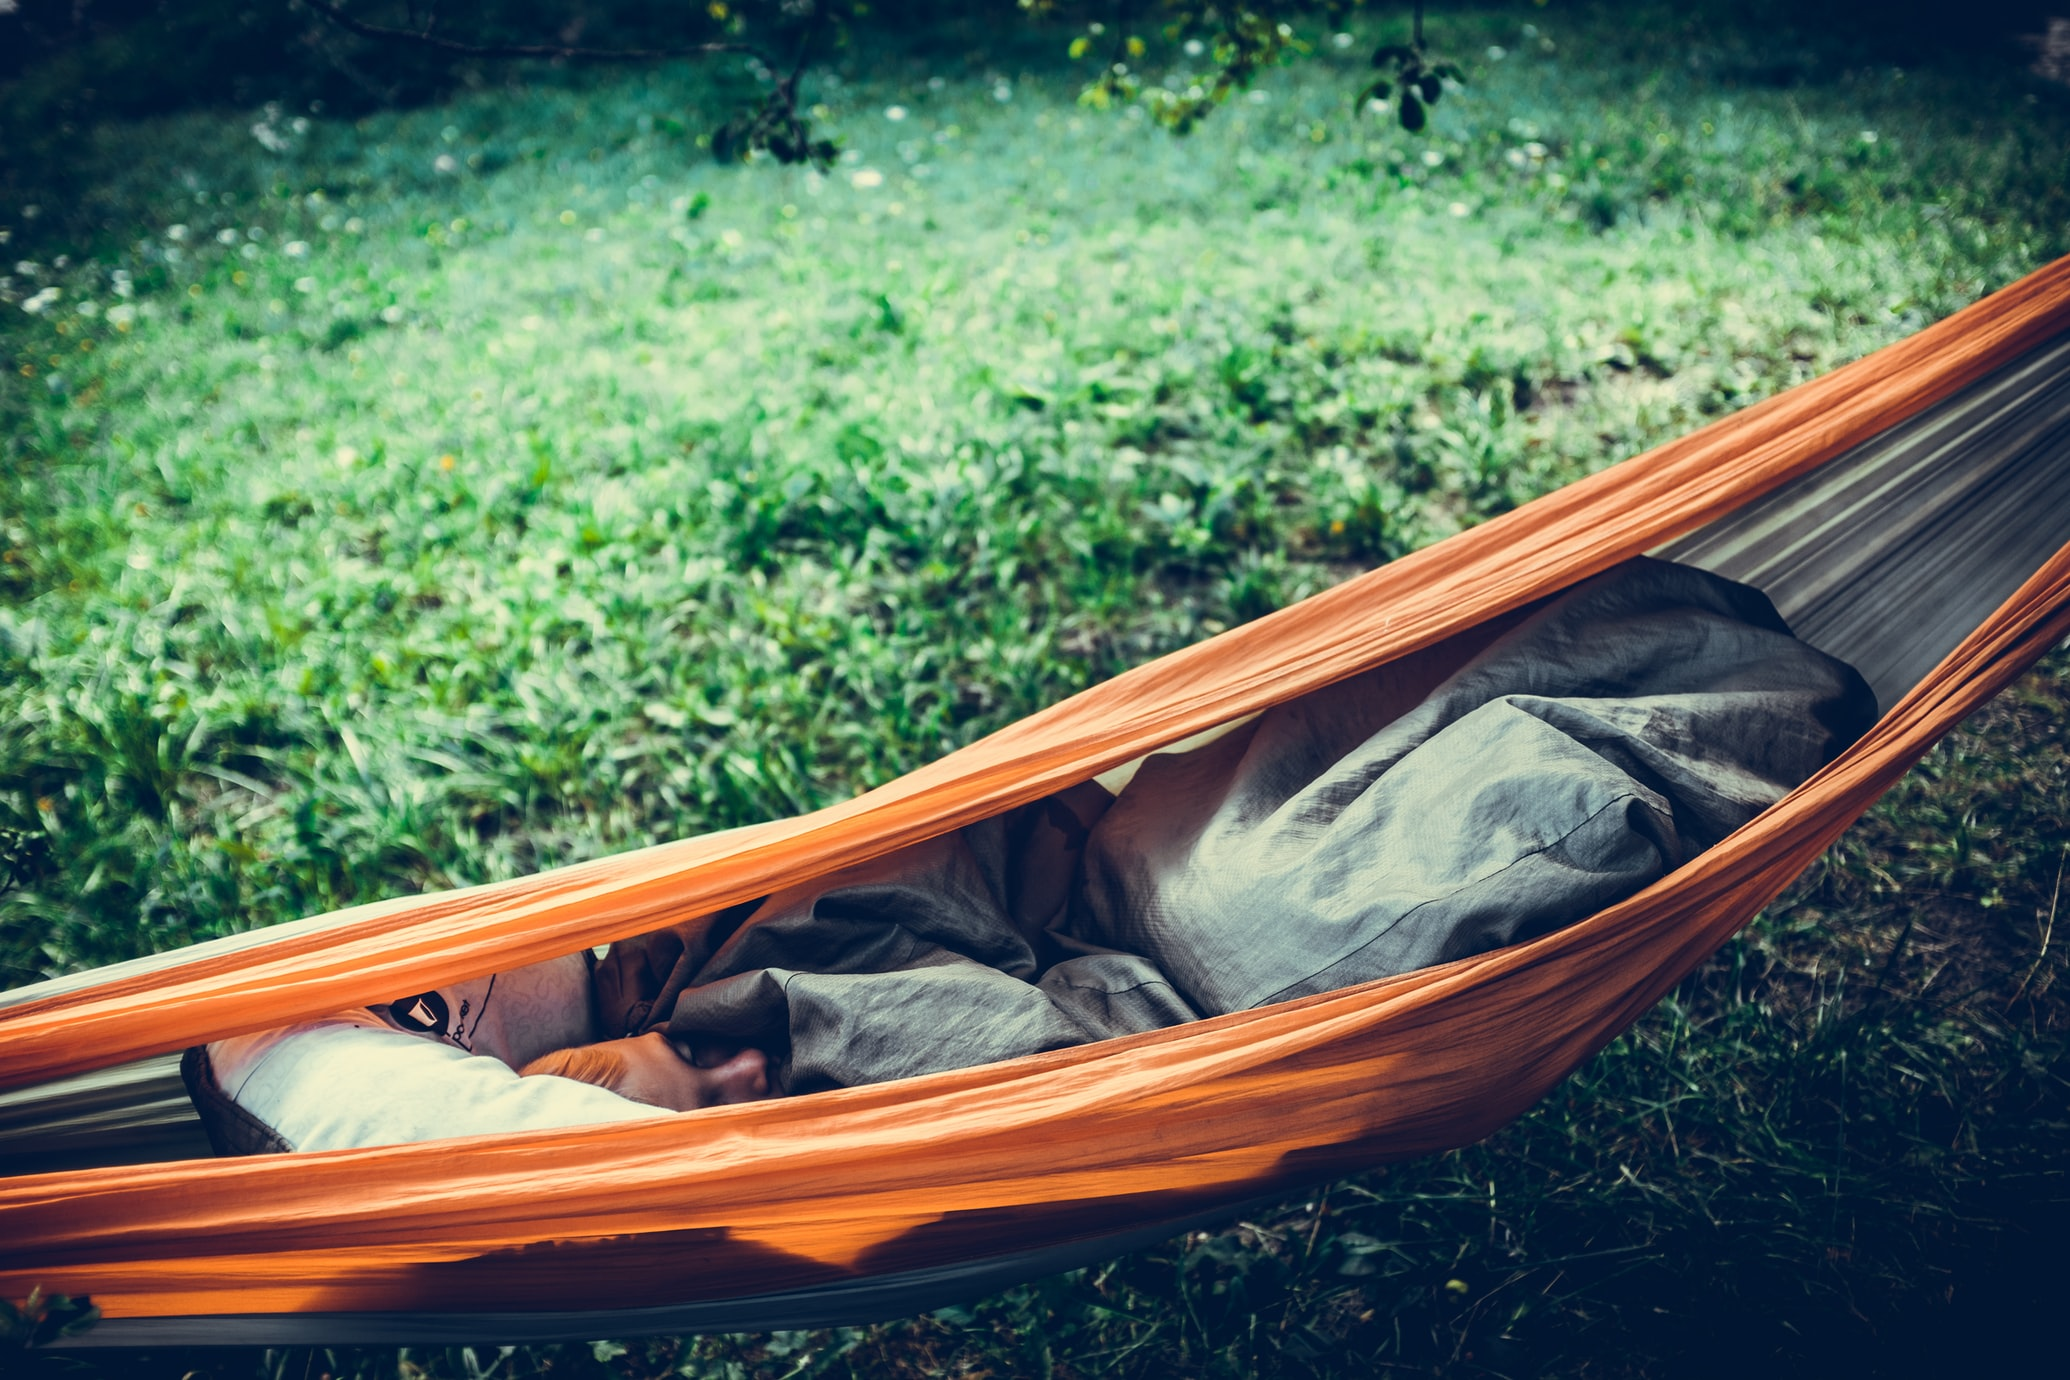 child sleeping in hammock